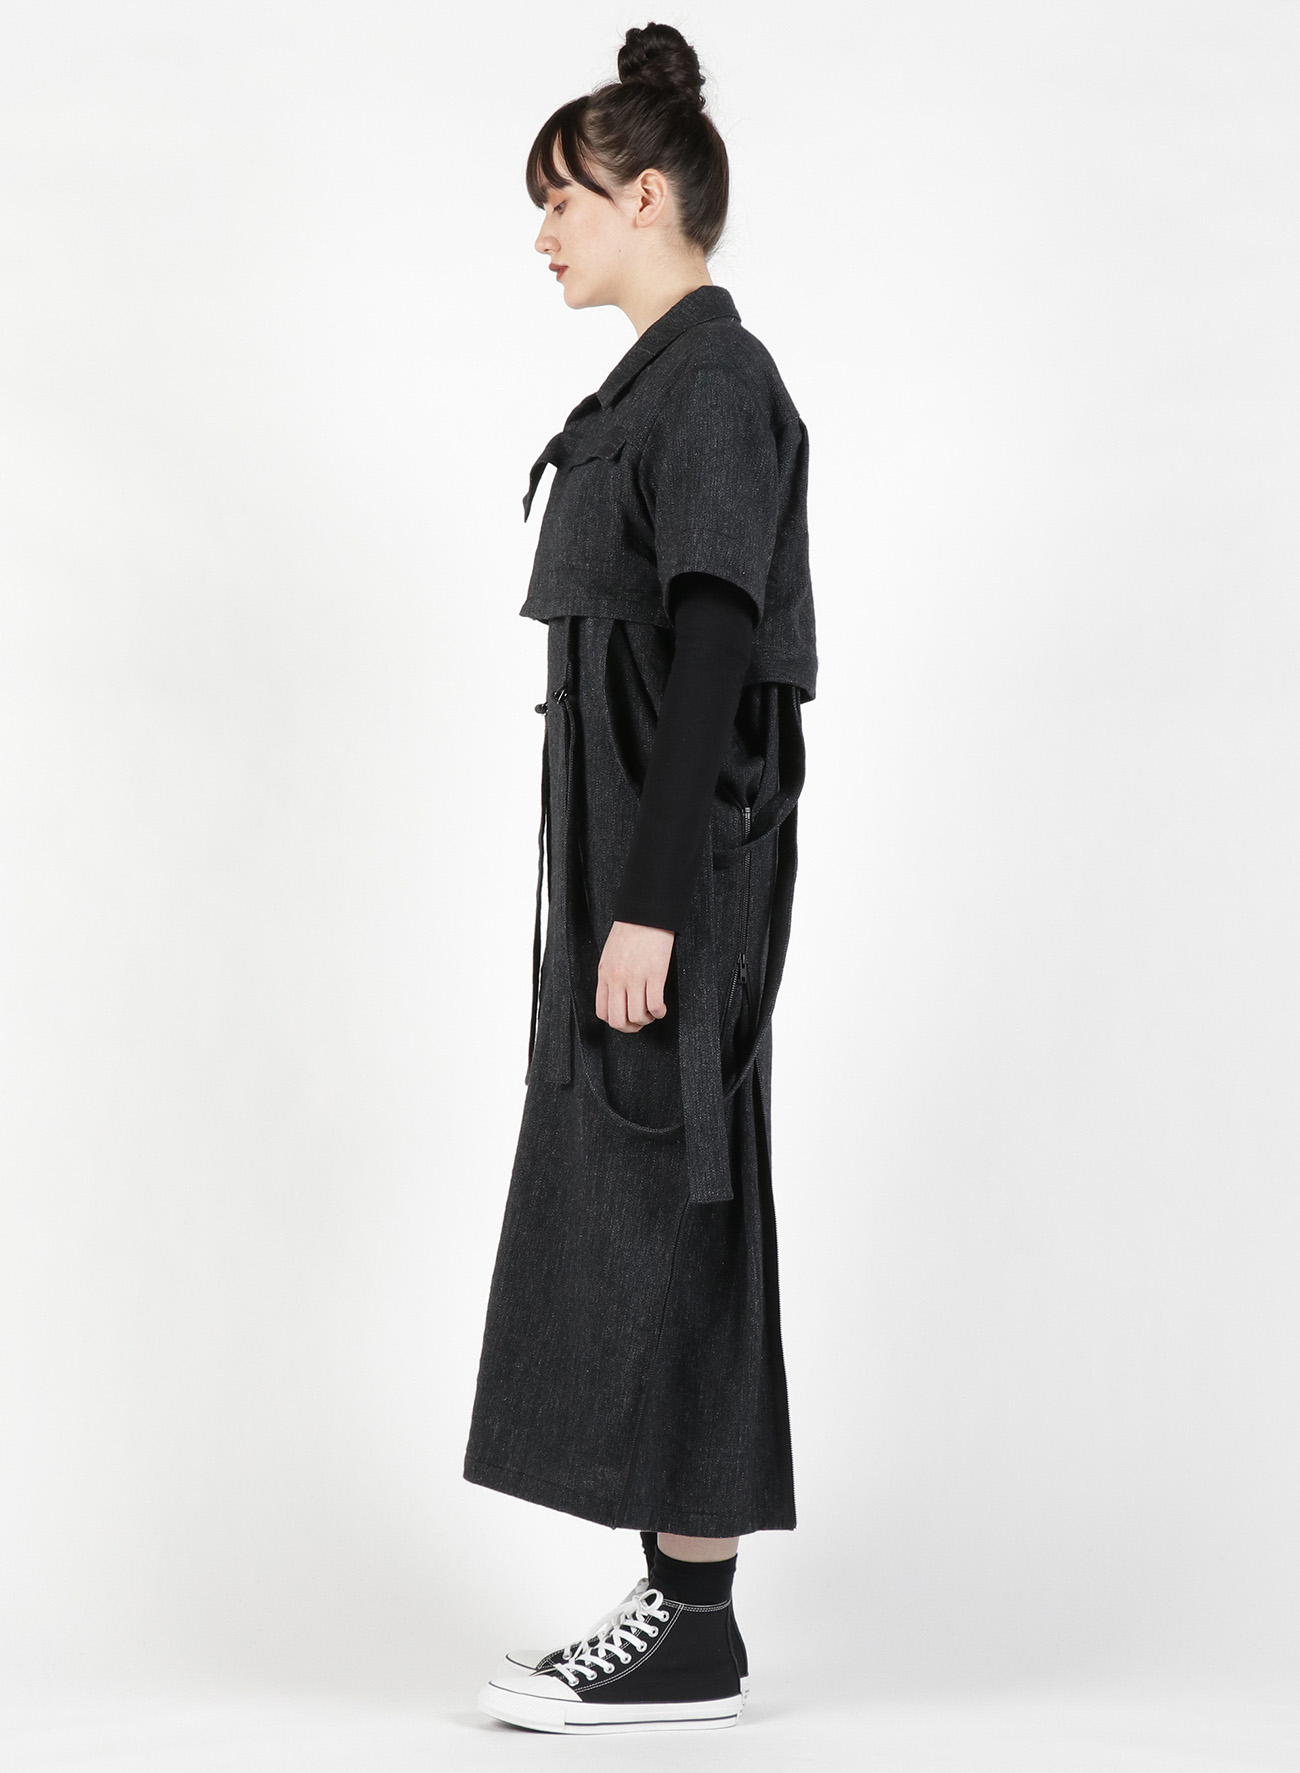 Li/W Herringbone Short Tape Jacket